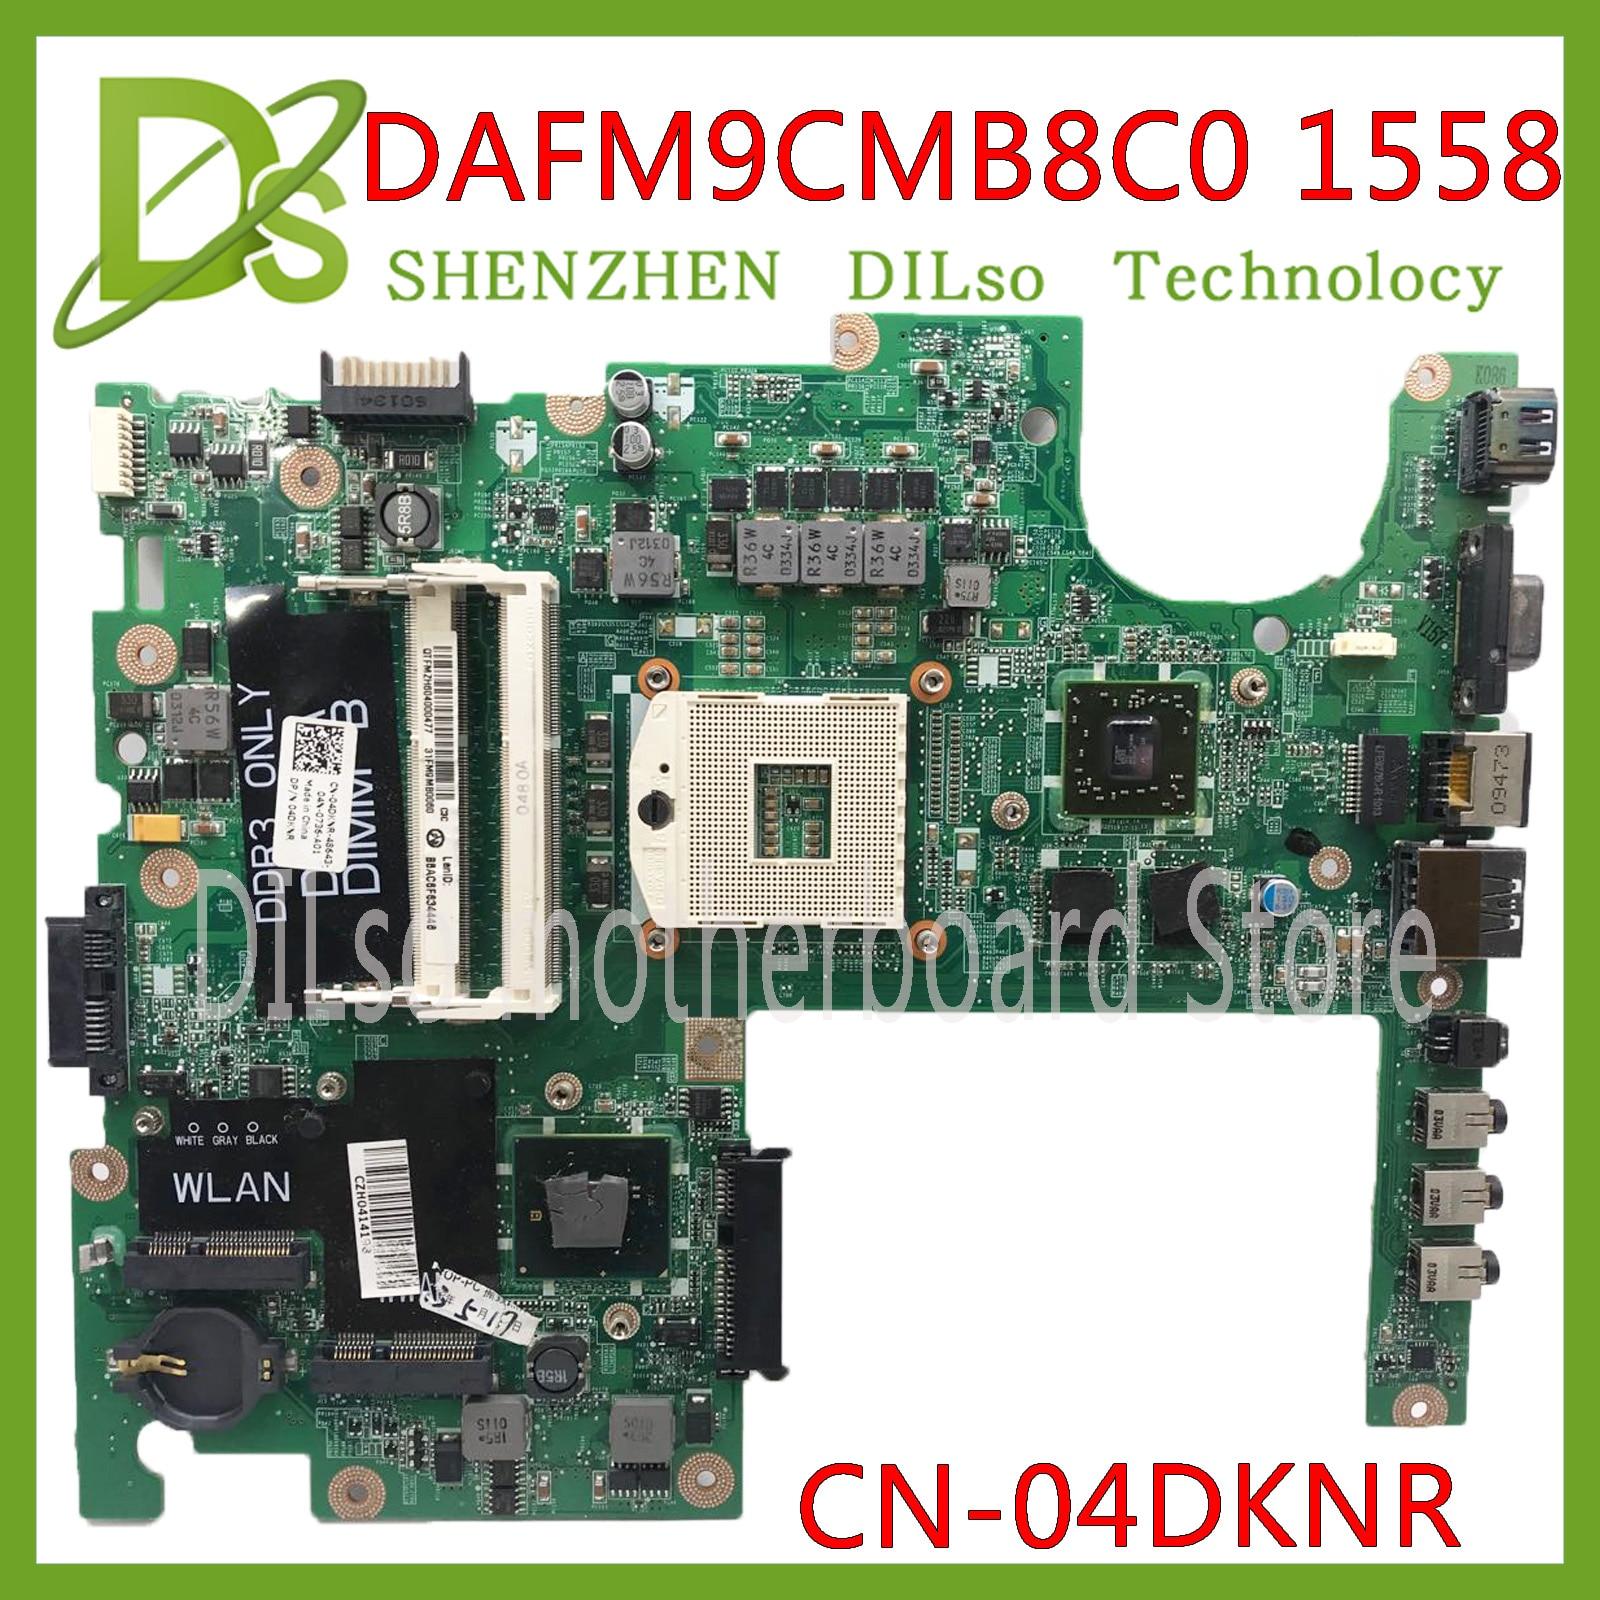 Kefu dafm9cmb8c0 placa-mãe para dell studio 1558 portátil placa-mãe CN-04DKNR hm55 pga989 ddr3 hd5470 1 gb original 100% testado